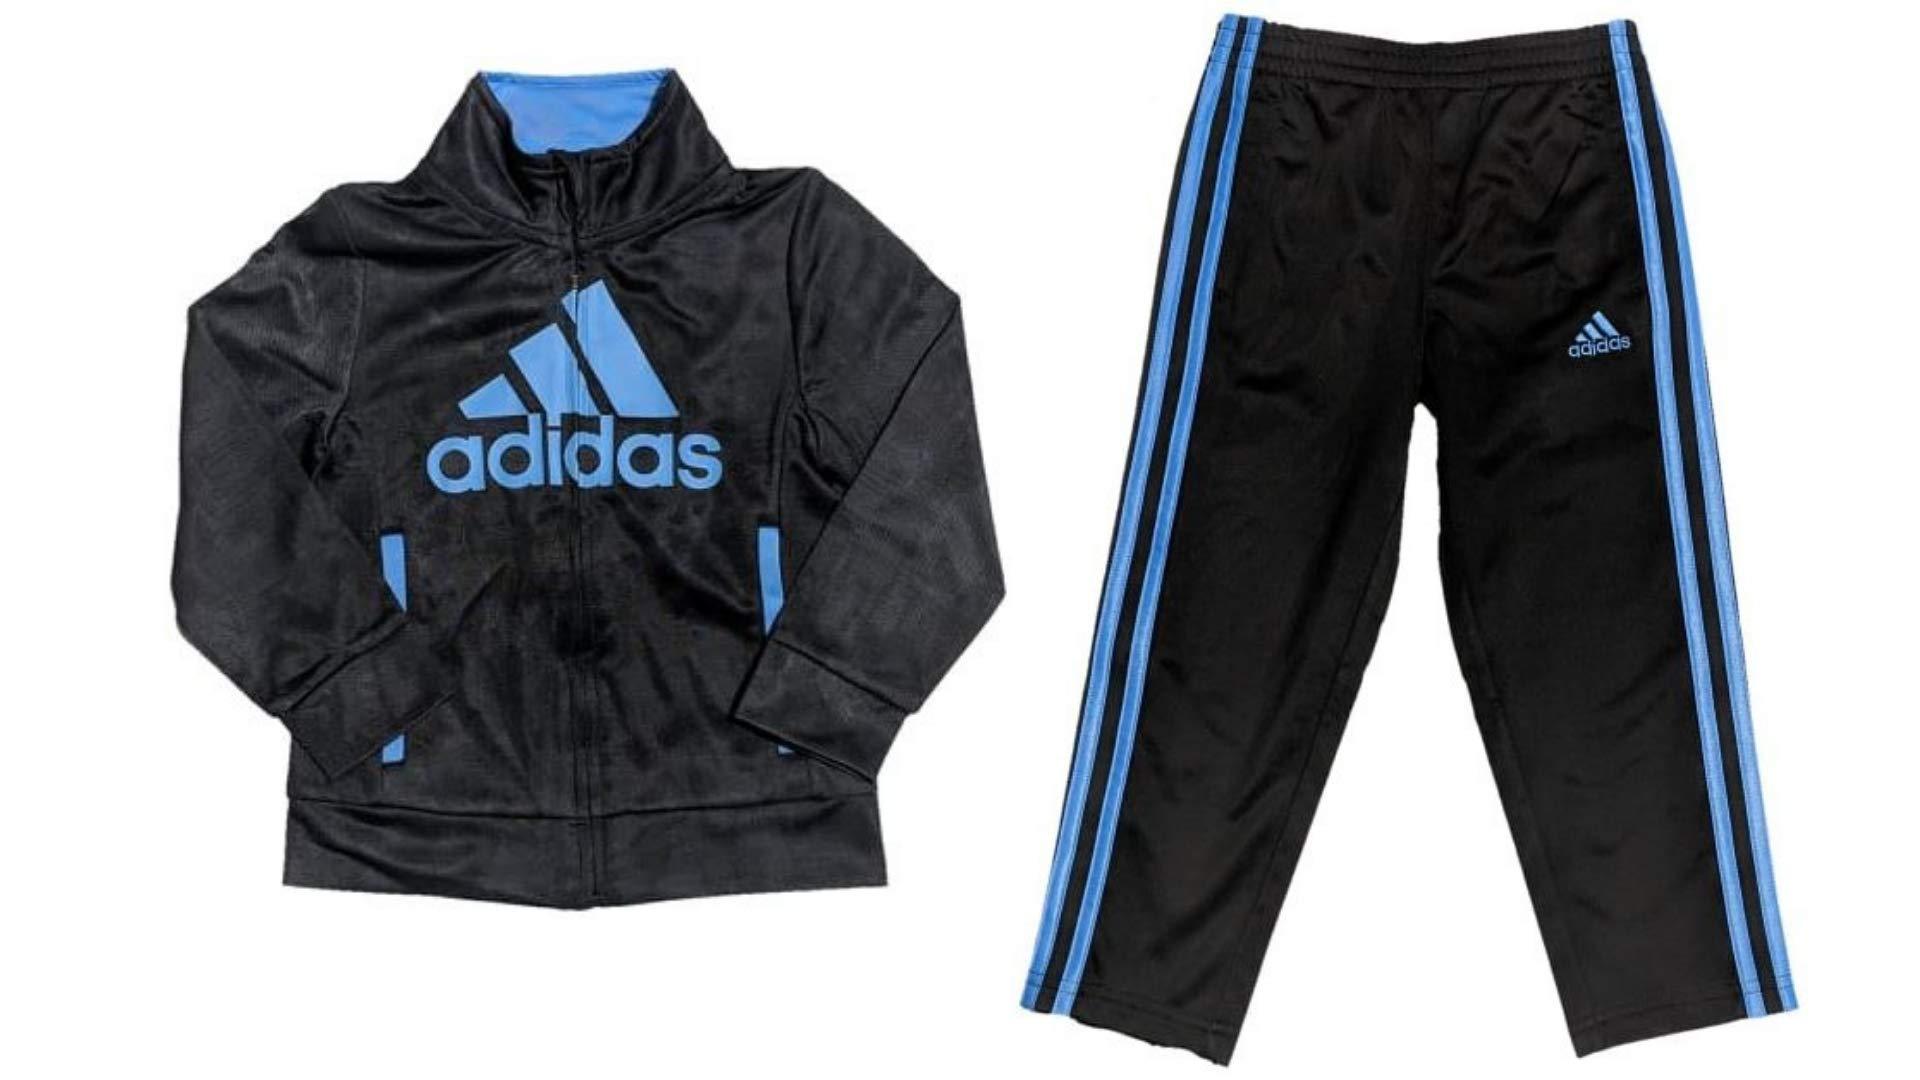 adidas Toddler Boys' Iconic Tricot Jacket and Pant Set, Black/Blue, 3T